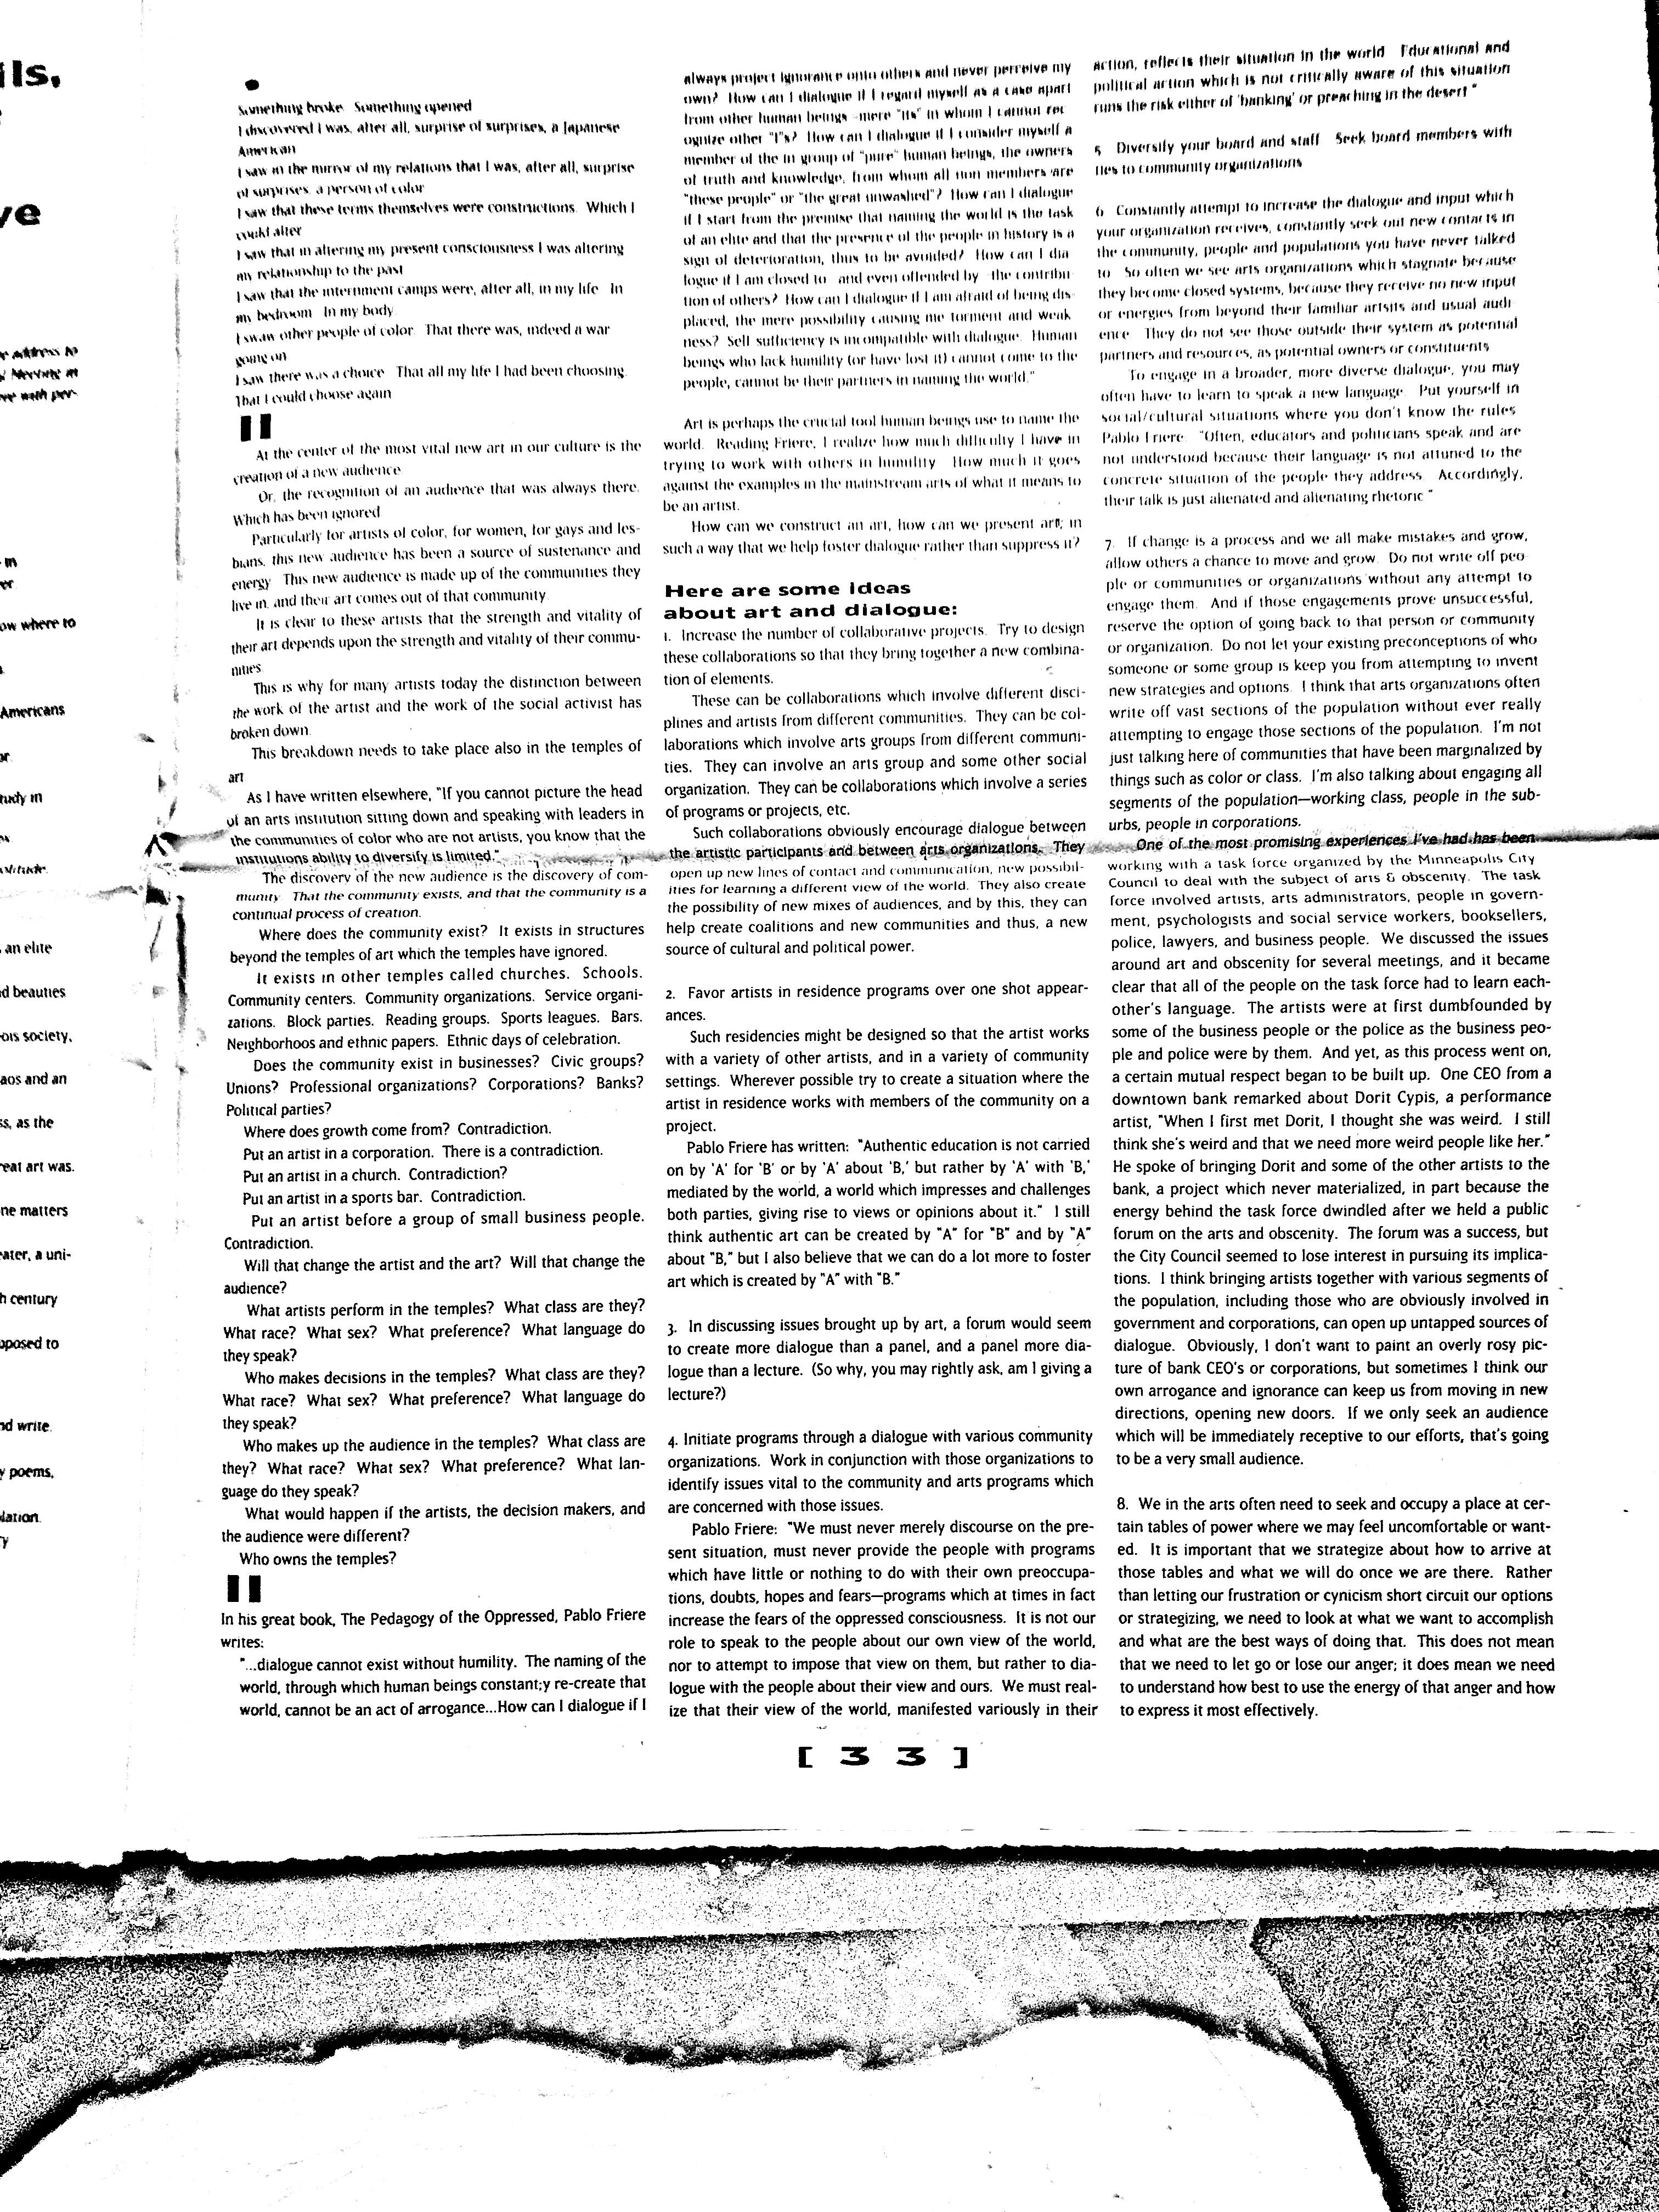 April 1993 - NAAO Bulletin Page 33.jpg